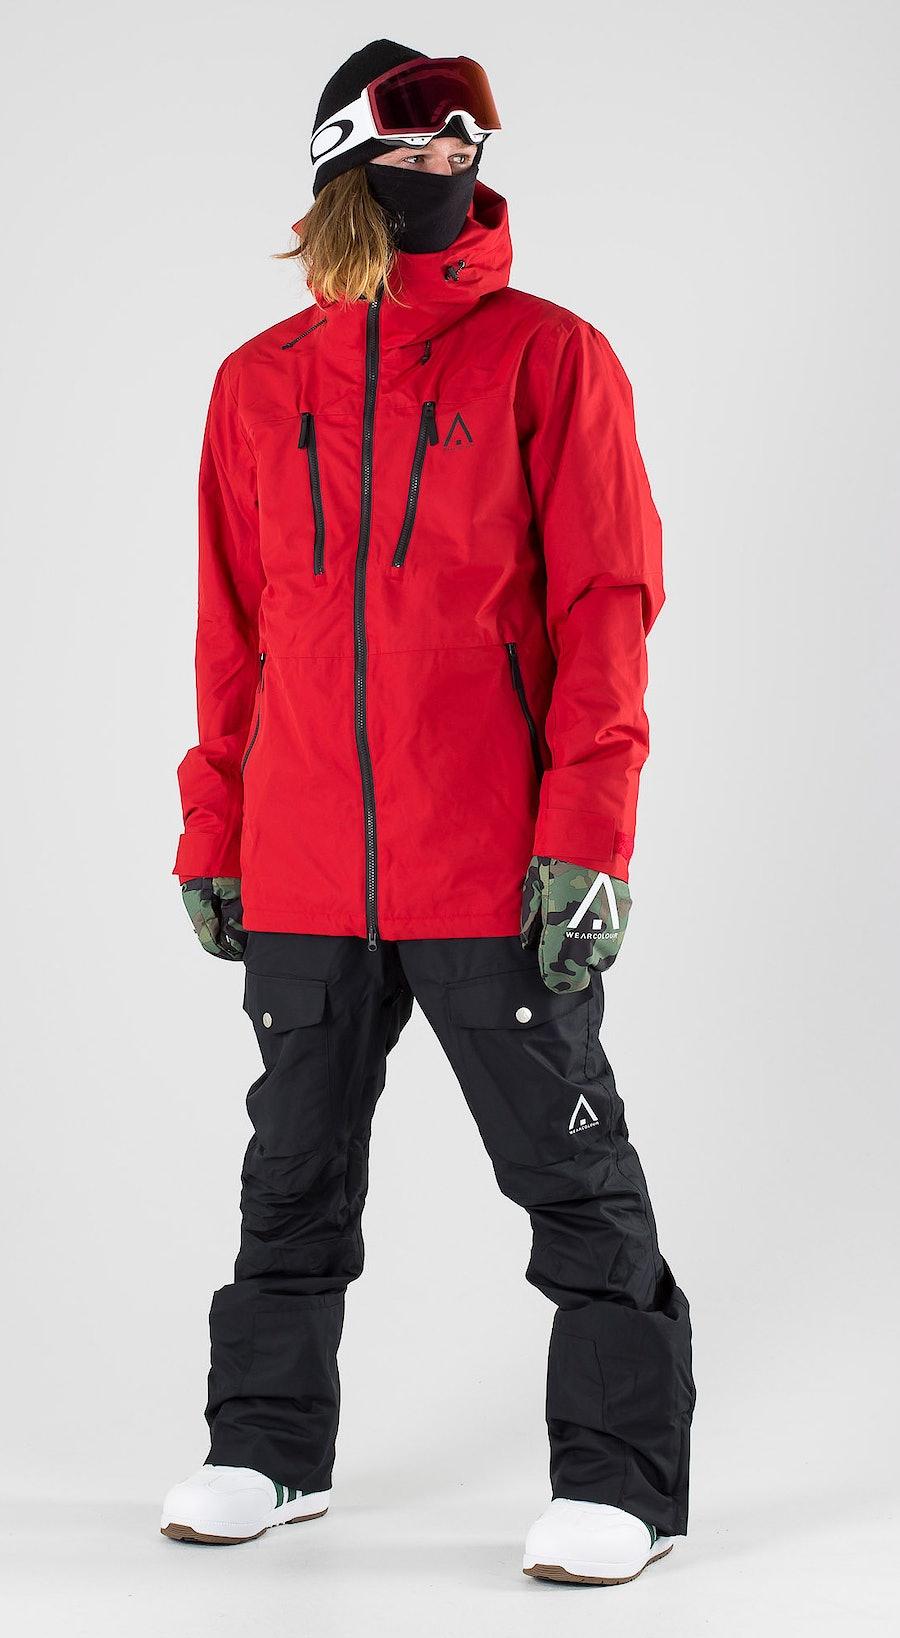 WearColour Grid Falu Red Snowboardkläder Multi